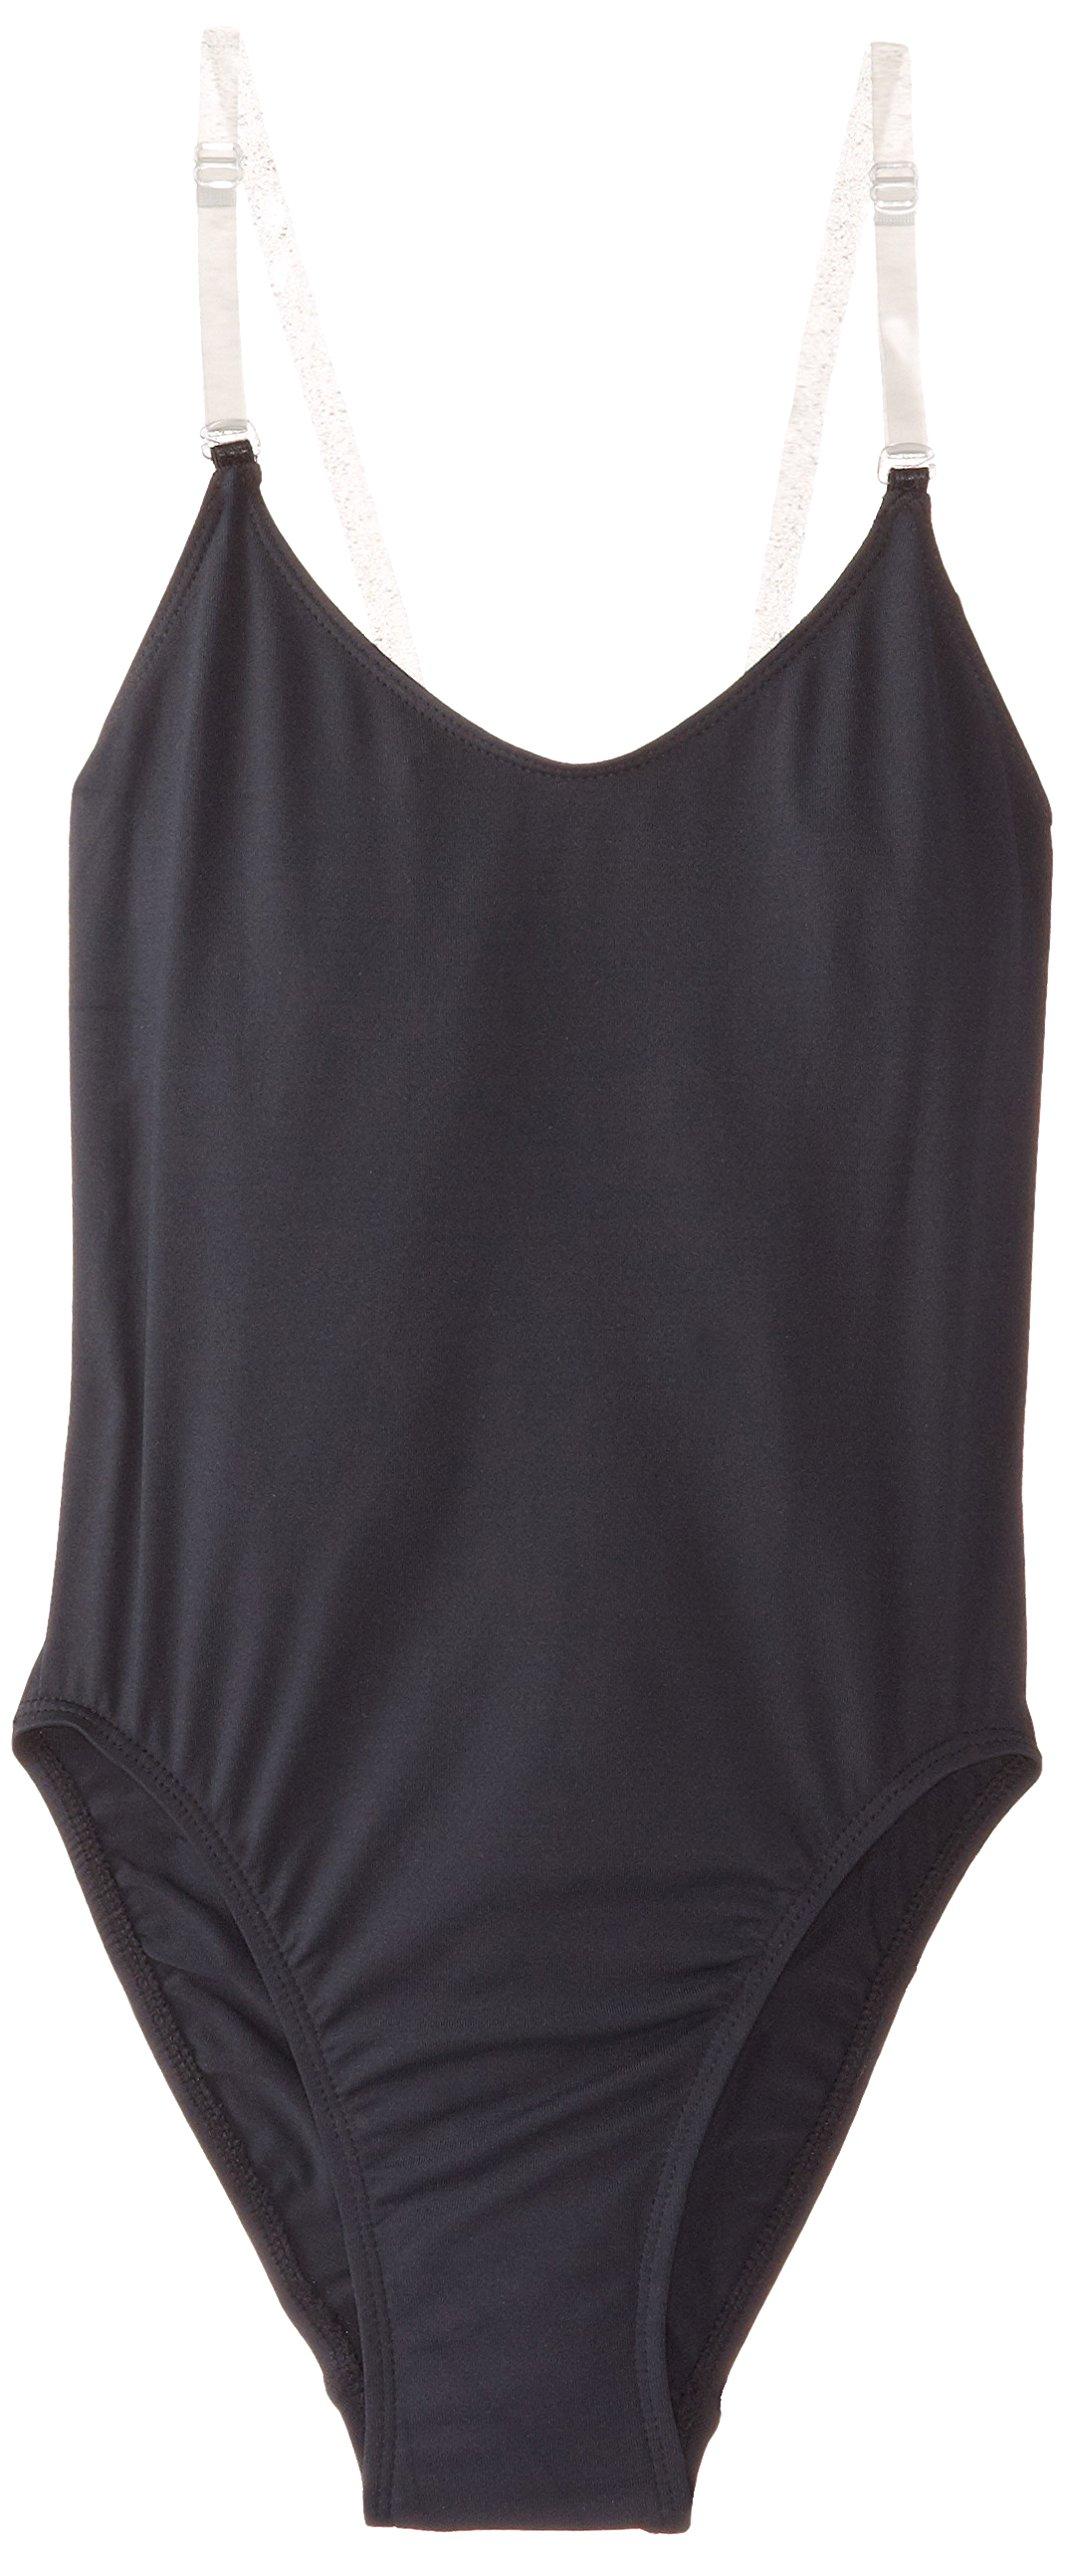 Capezio Women's Camisole Leotard with Clear Transition Straps, Black, X-Large by Capezio